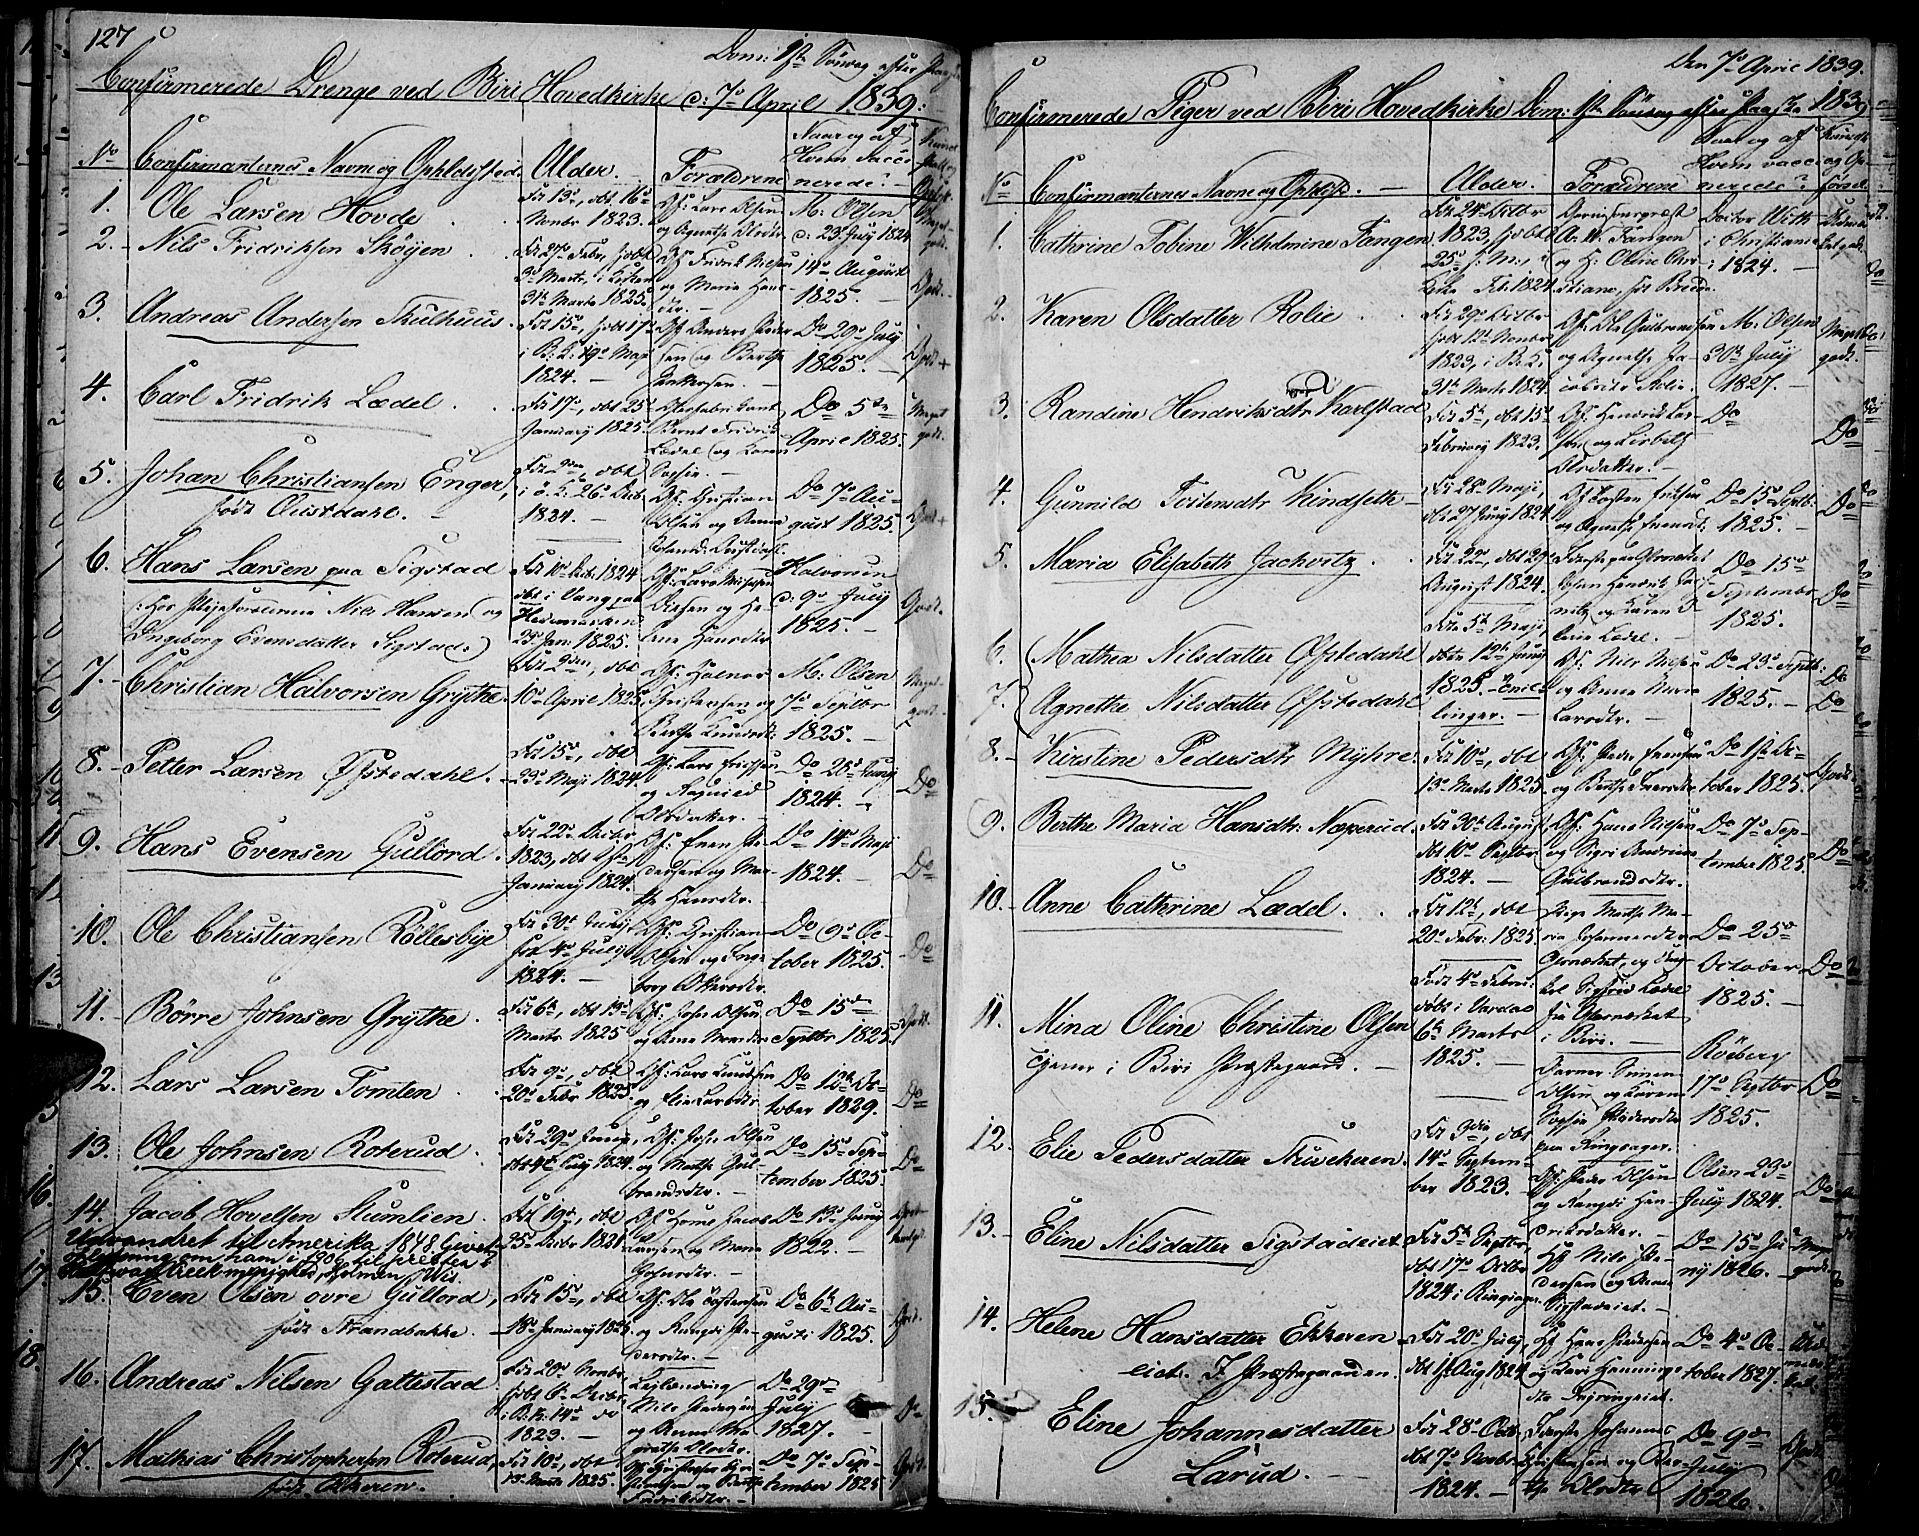 SAH, Biri prestekontor, Ministerialbok nr. 4, 1829-1842, s. 127